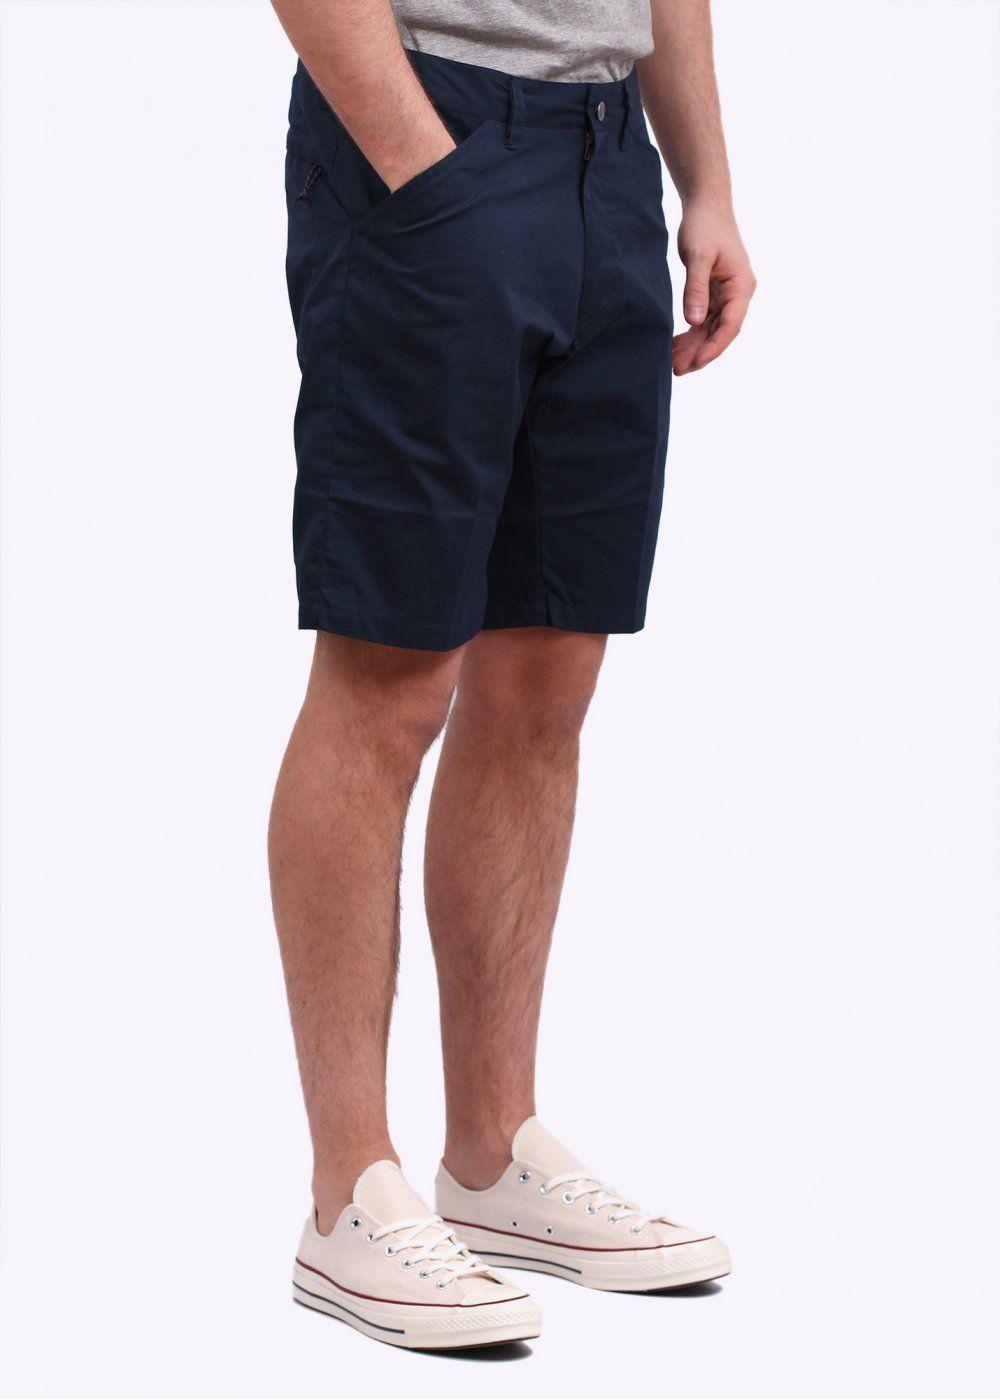 High Coast Shorts Shorts für Damen lFSWbrx8G